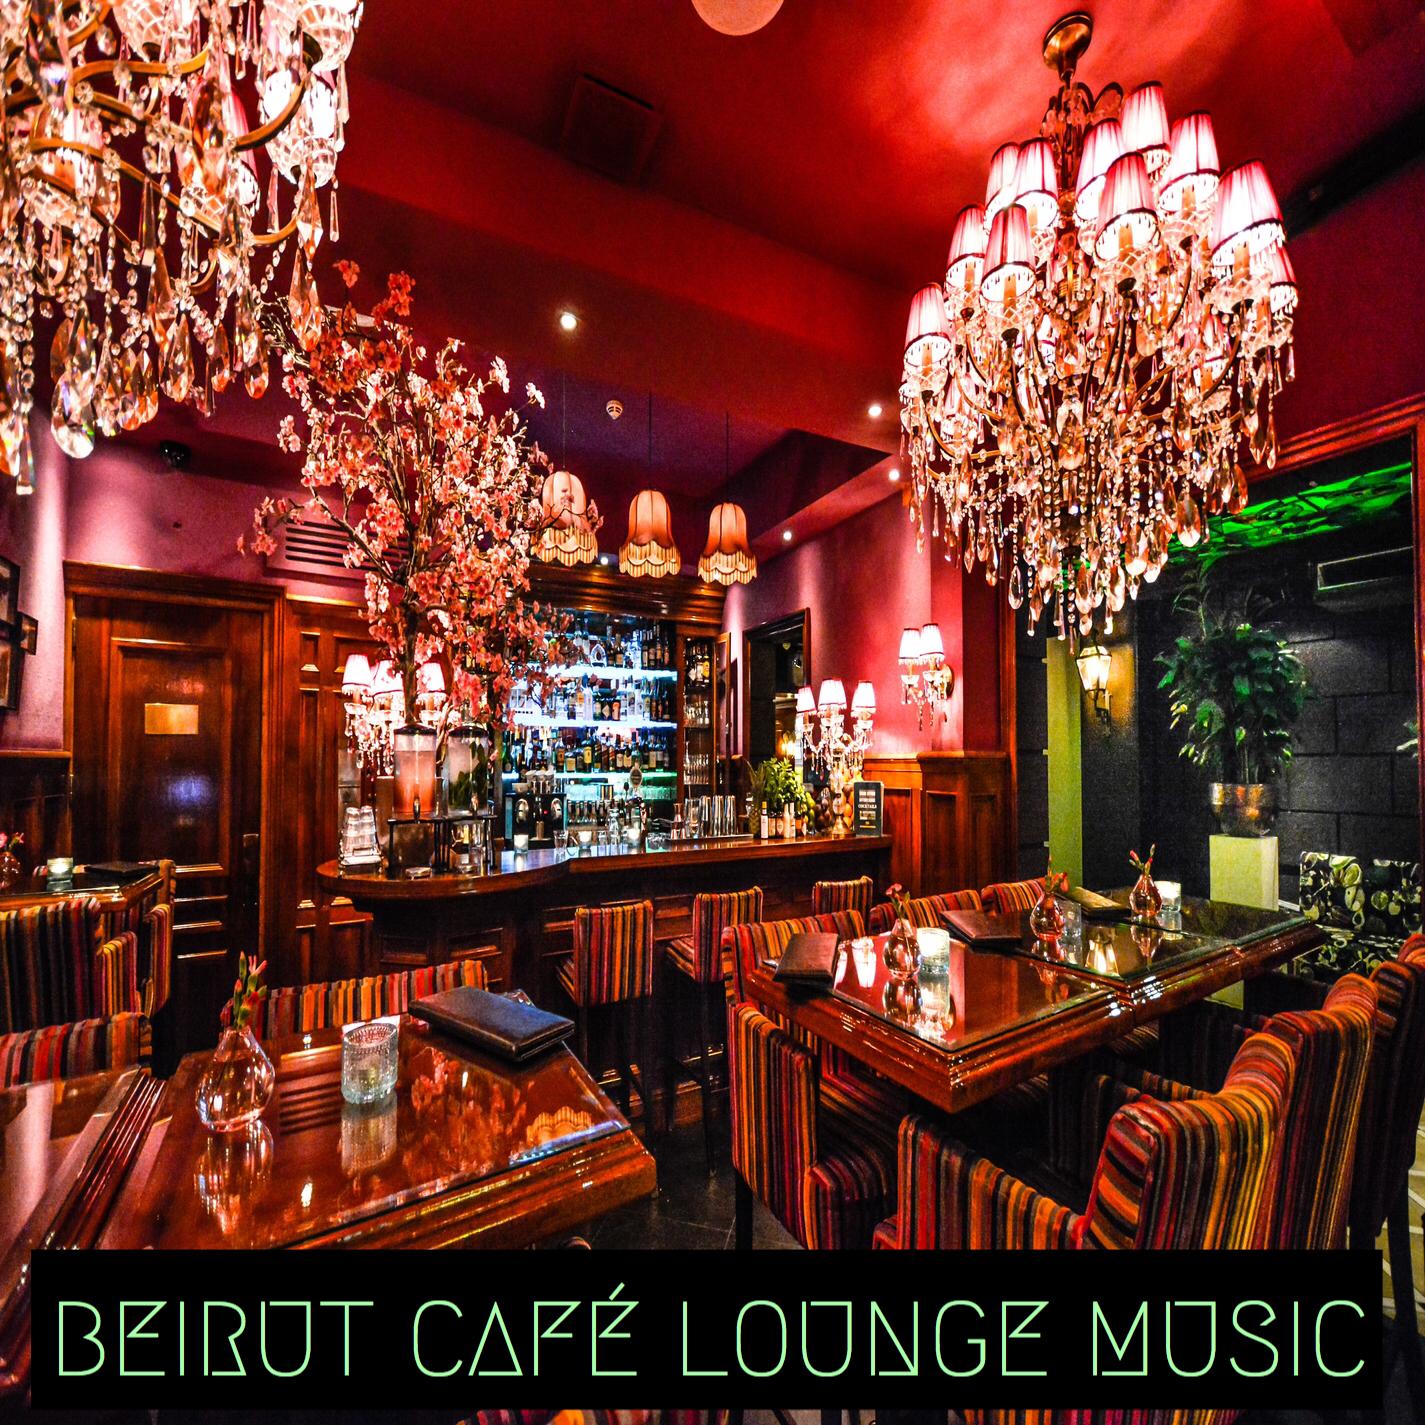 Beirut Café Lounge Music Mp3 Download